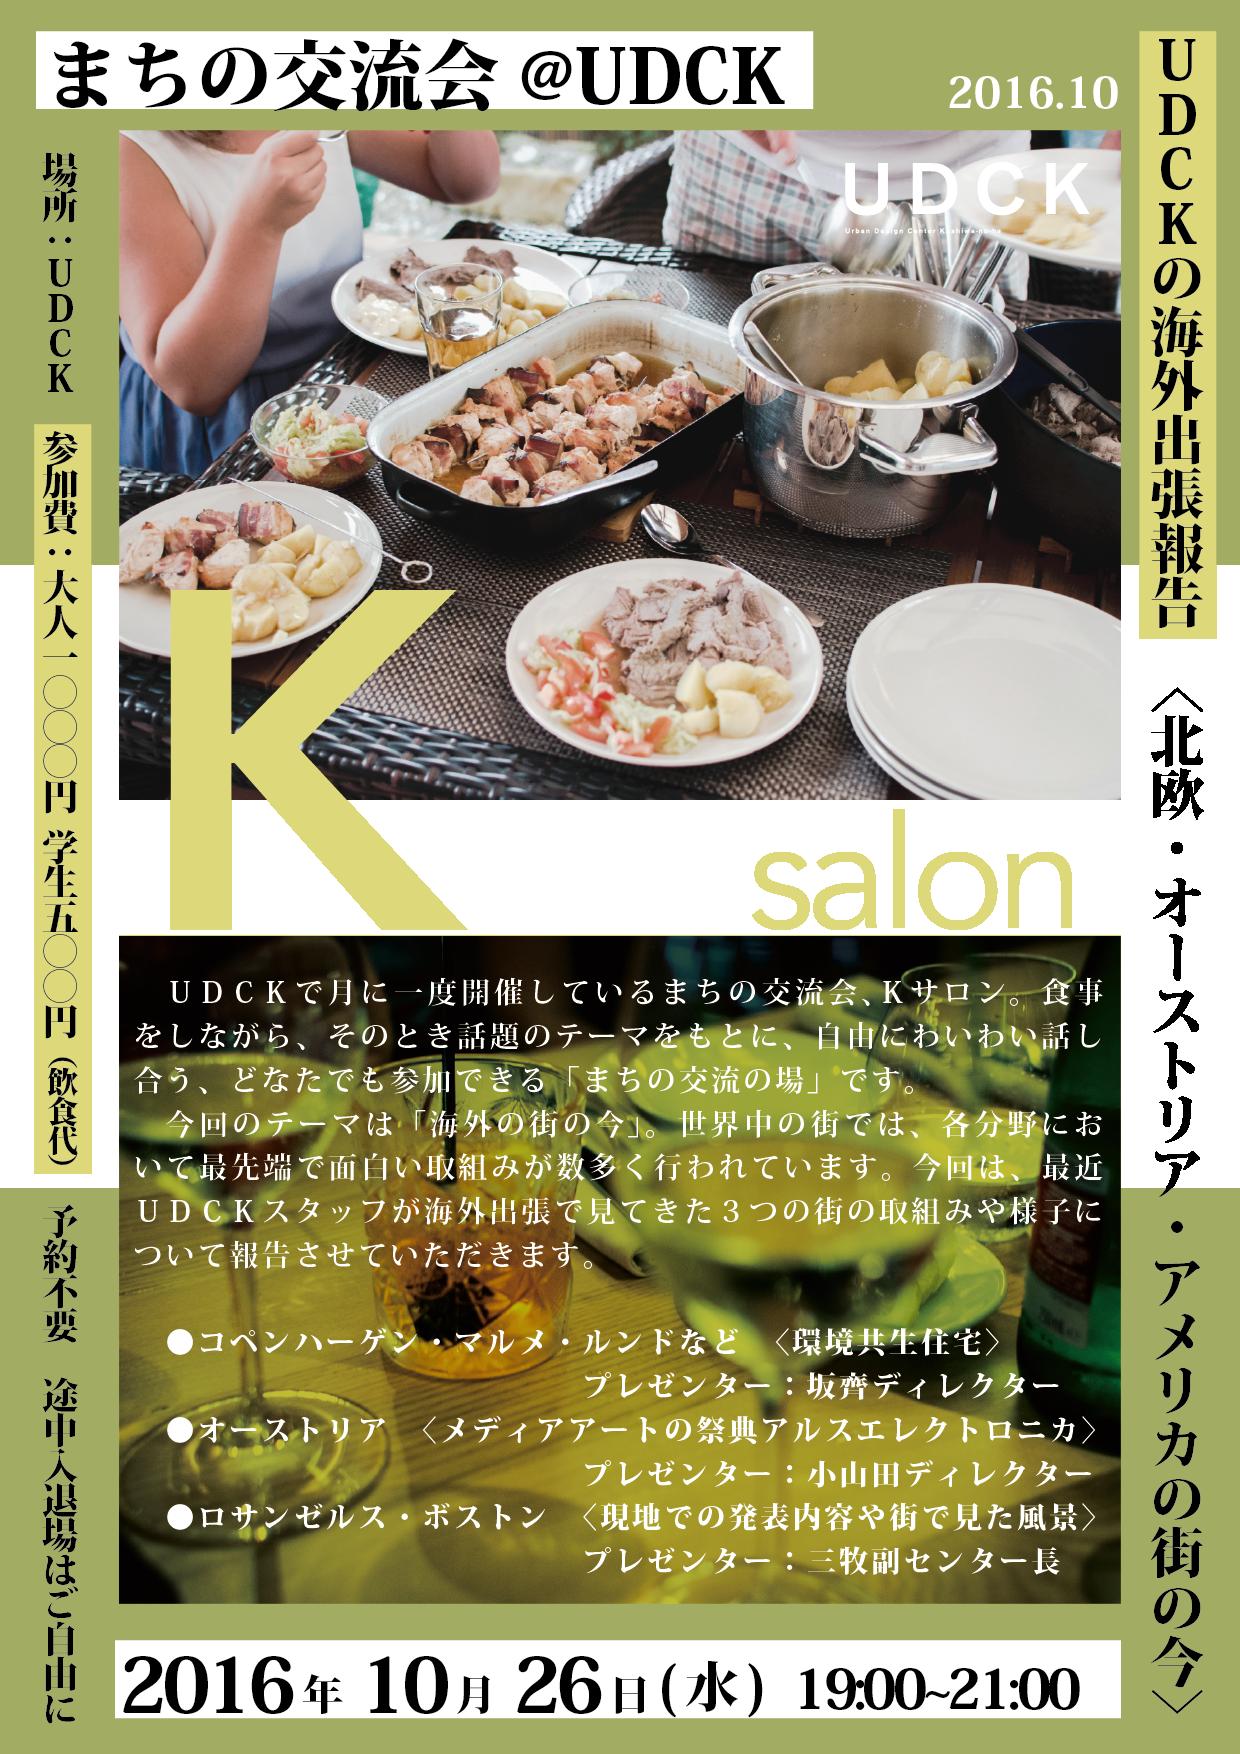 http://www.udck.jp/event/2016_10_Ksalon-01.png